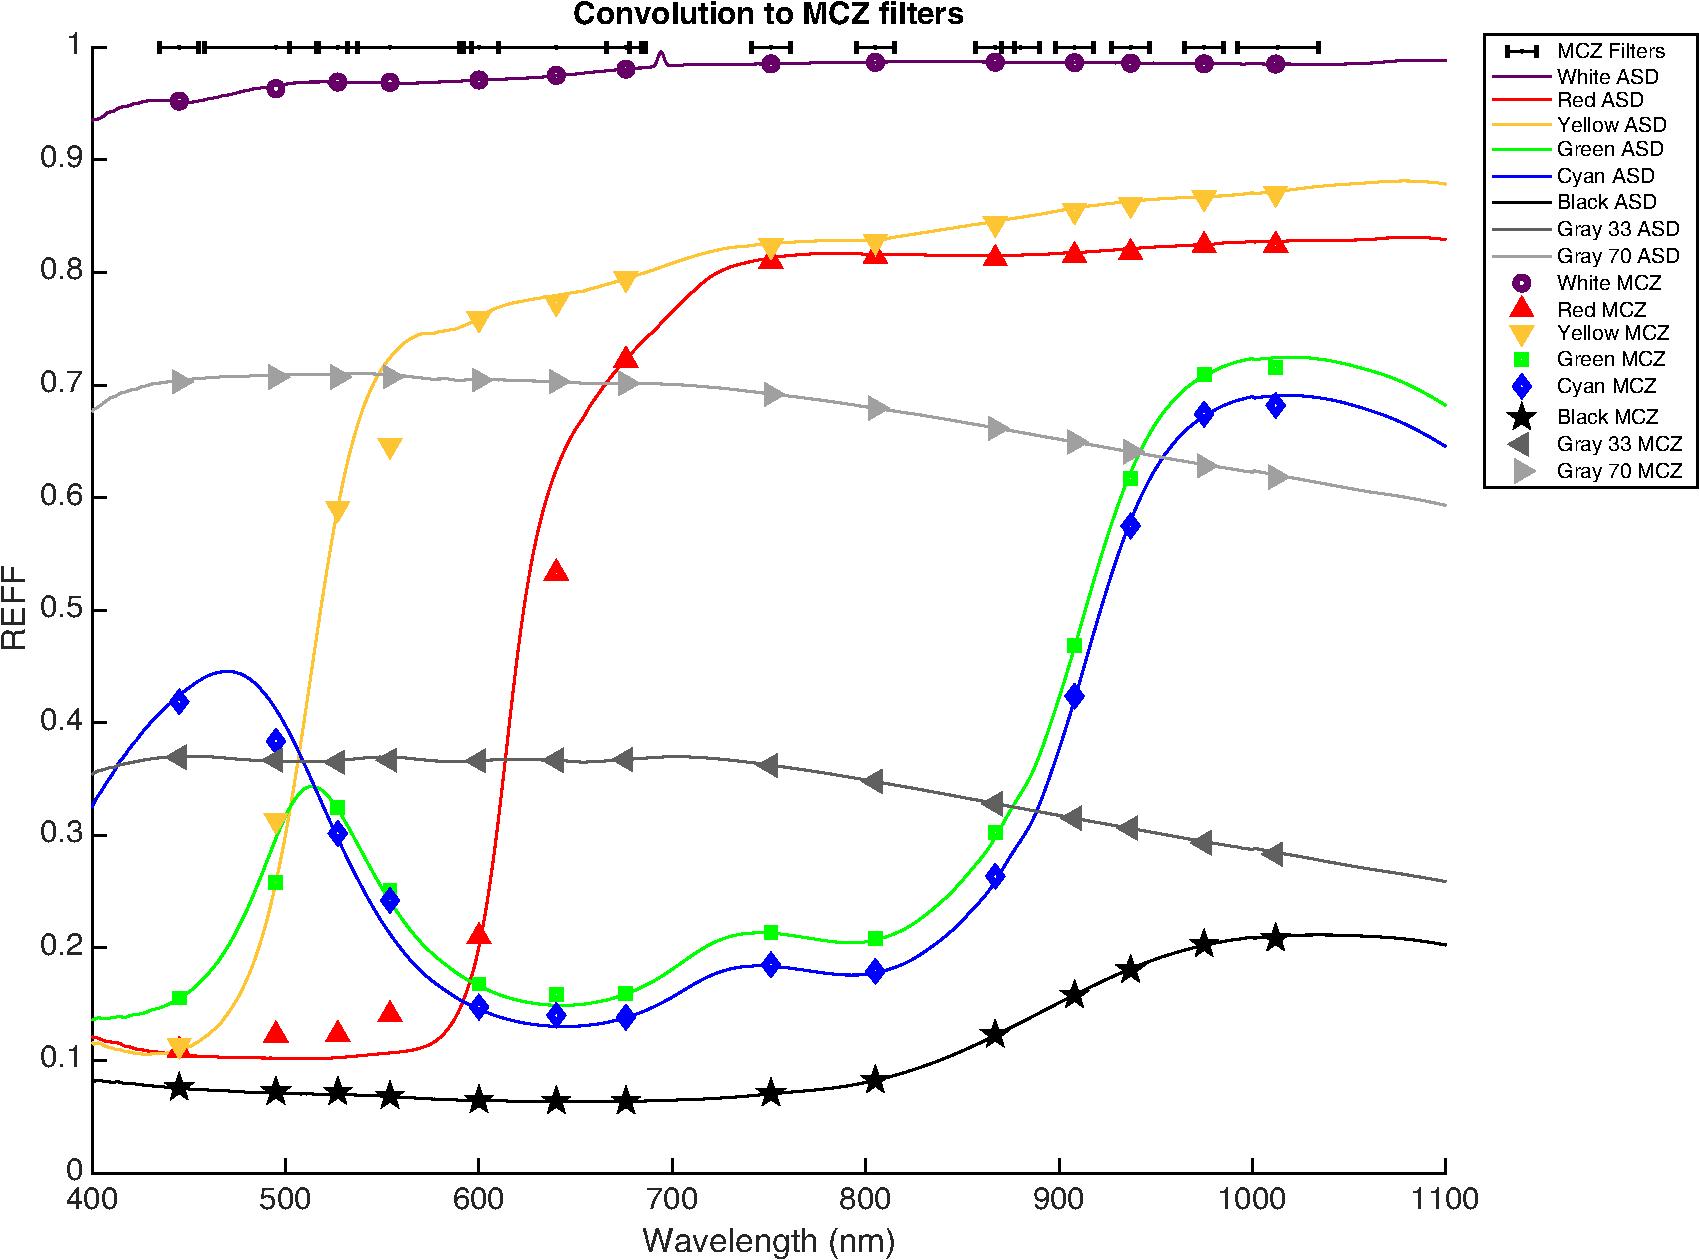 Photometric characterization of Lucideon and Avian Technologies